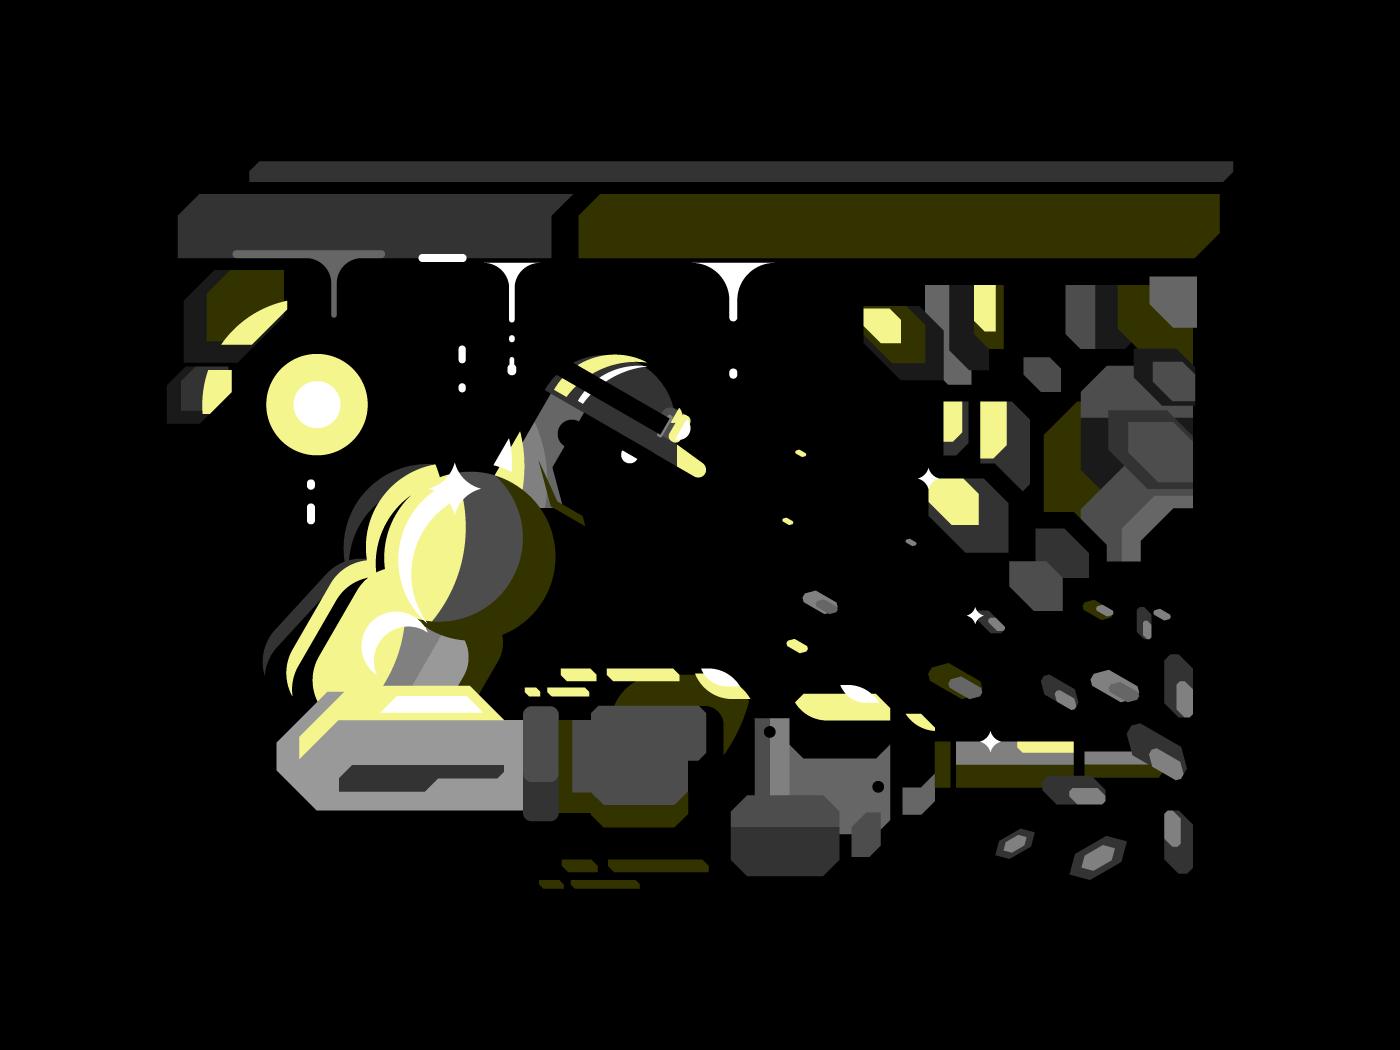 Miner character flat vector illustration